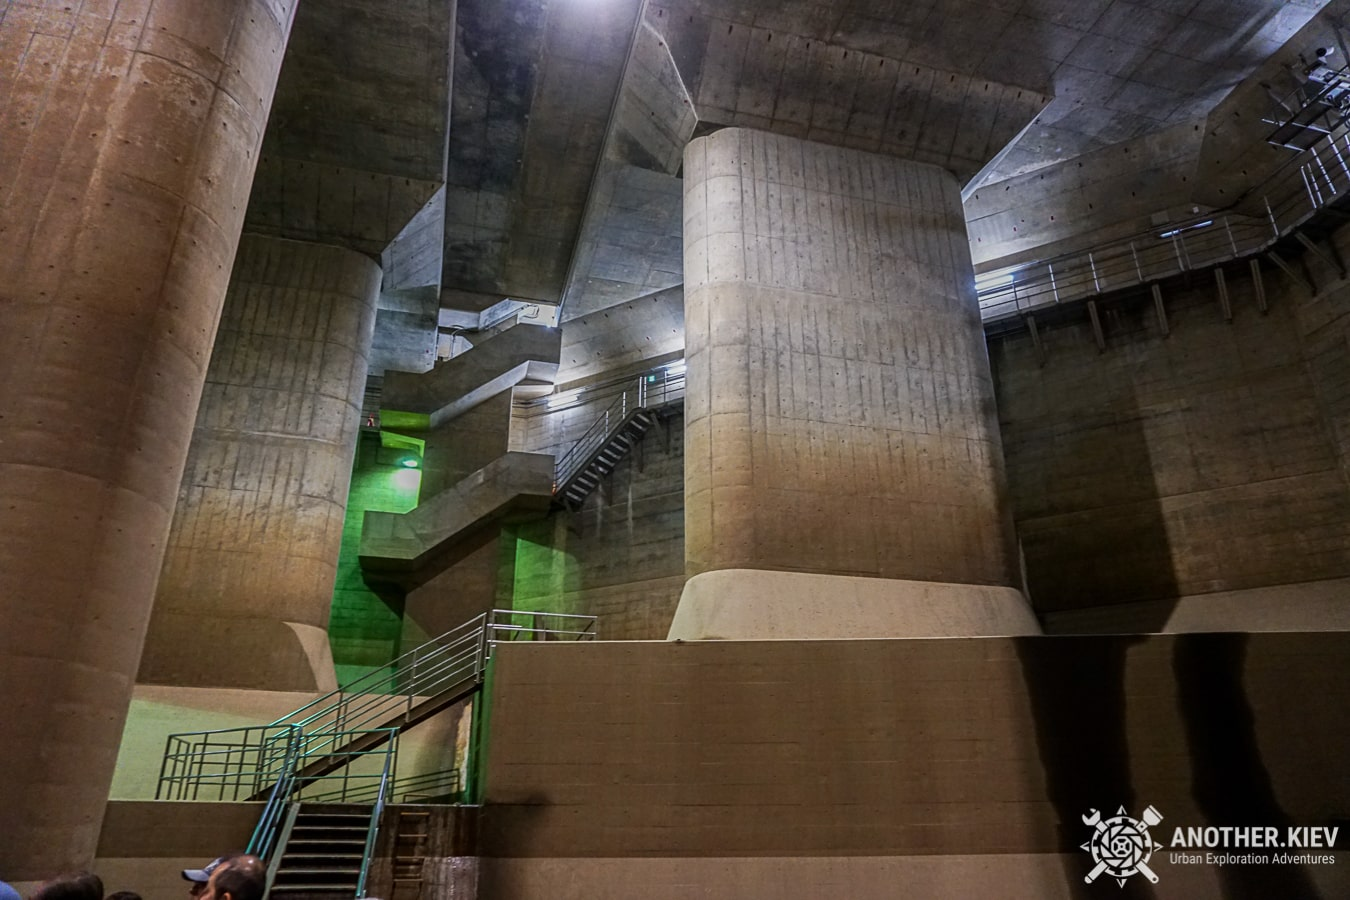 j-cans-urbex-tour-10-min Экскурсия в Токийский противопаводковый коллектор